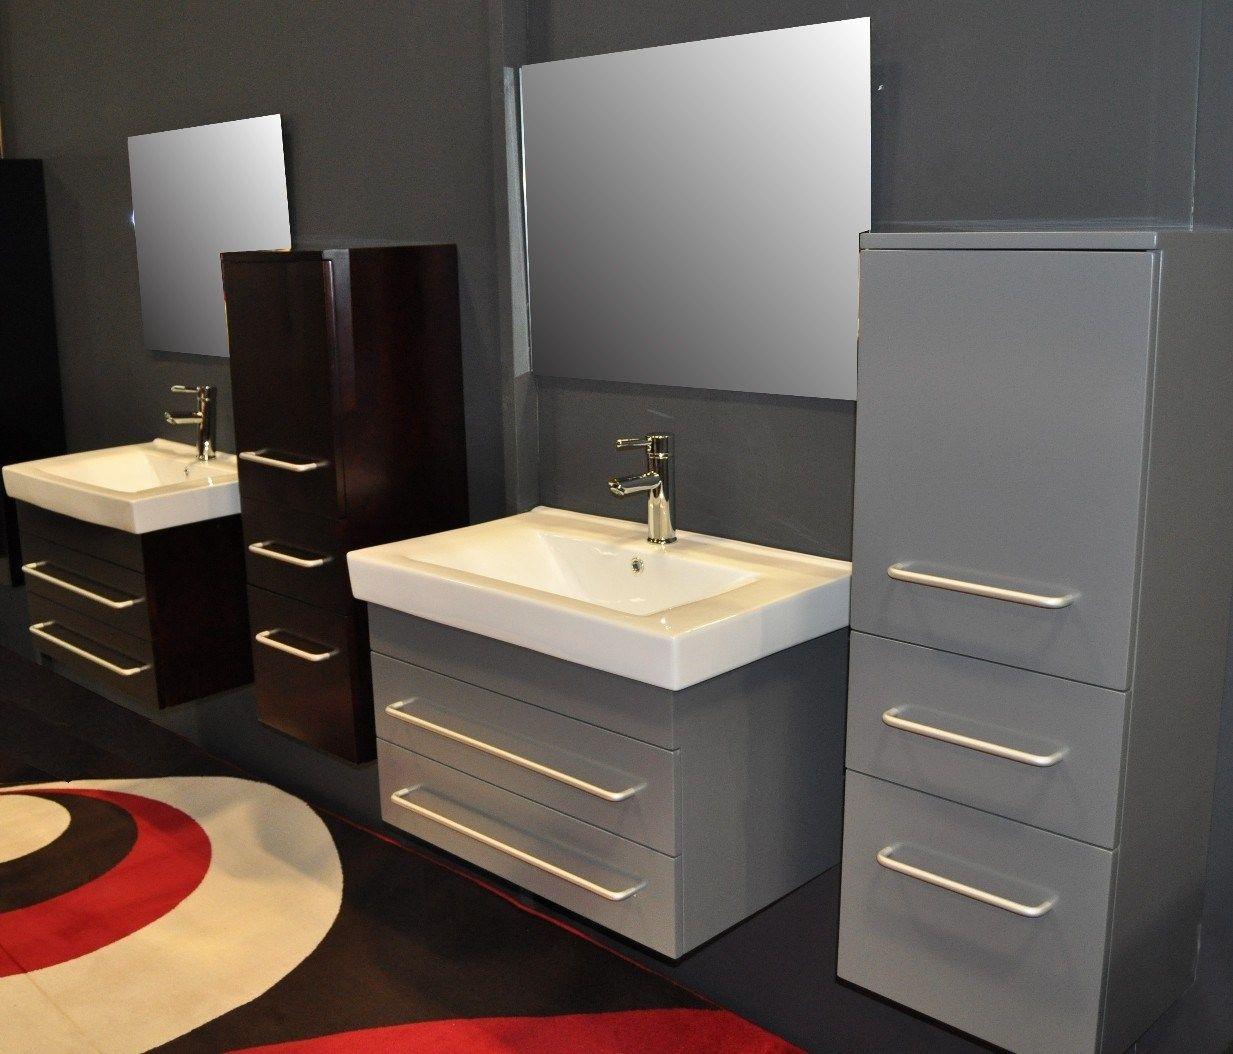 20 beautiful bathroom sink design ideas pictures house reno rh in pinterest com